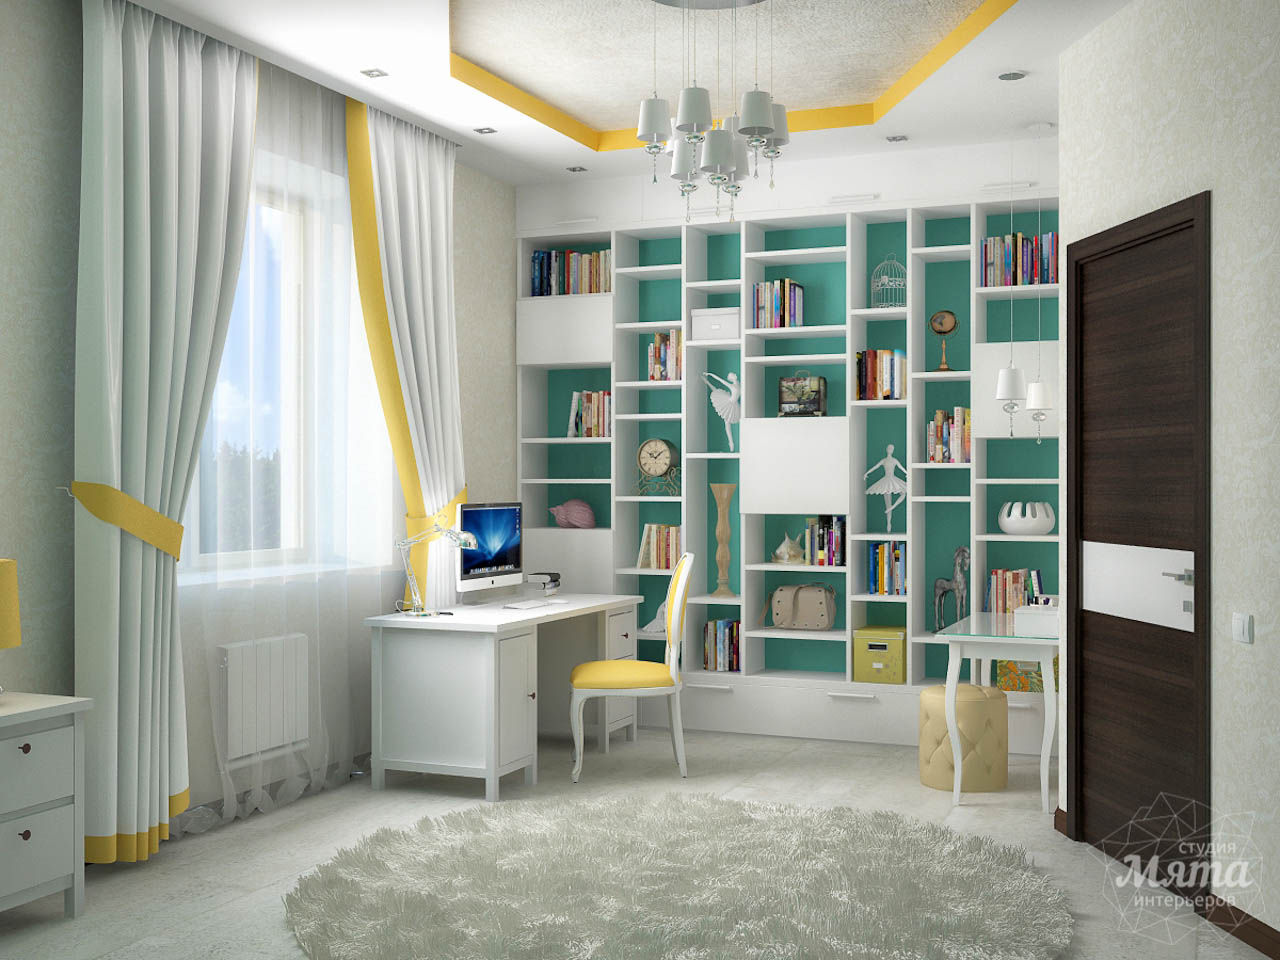 Дизайн проект интерьера коттеджа  в стиле минимализм по ул. Барвинка 15 img1776096223